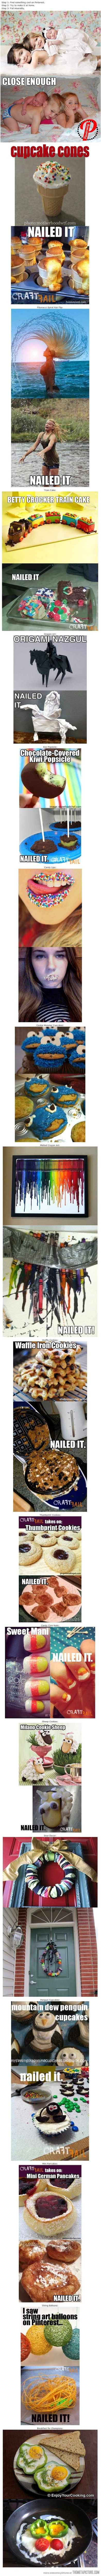 #funny #humor #nailedit #pinterest #lol